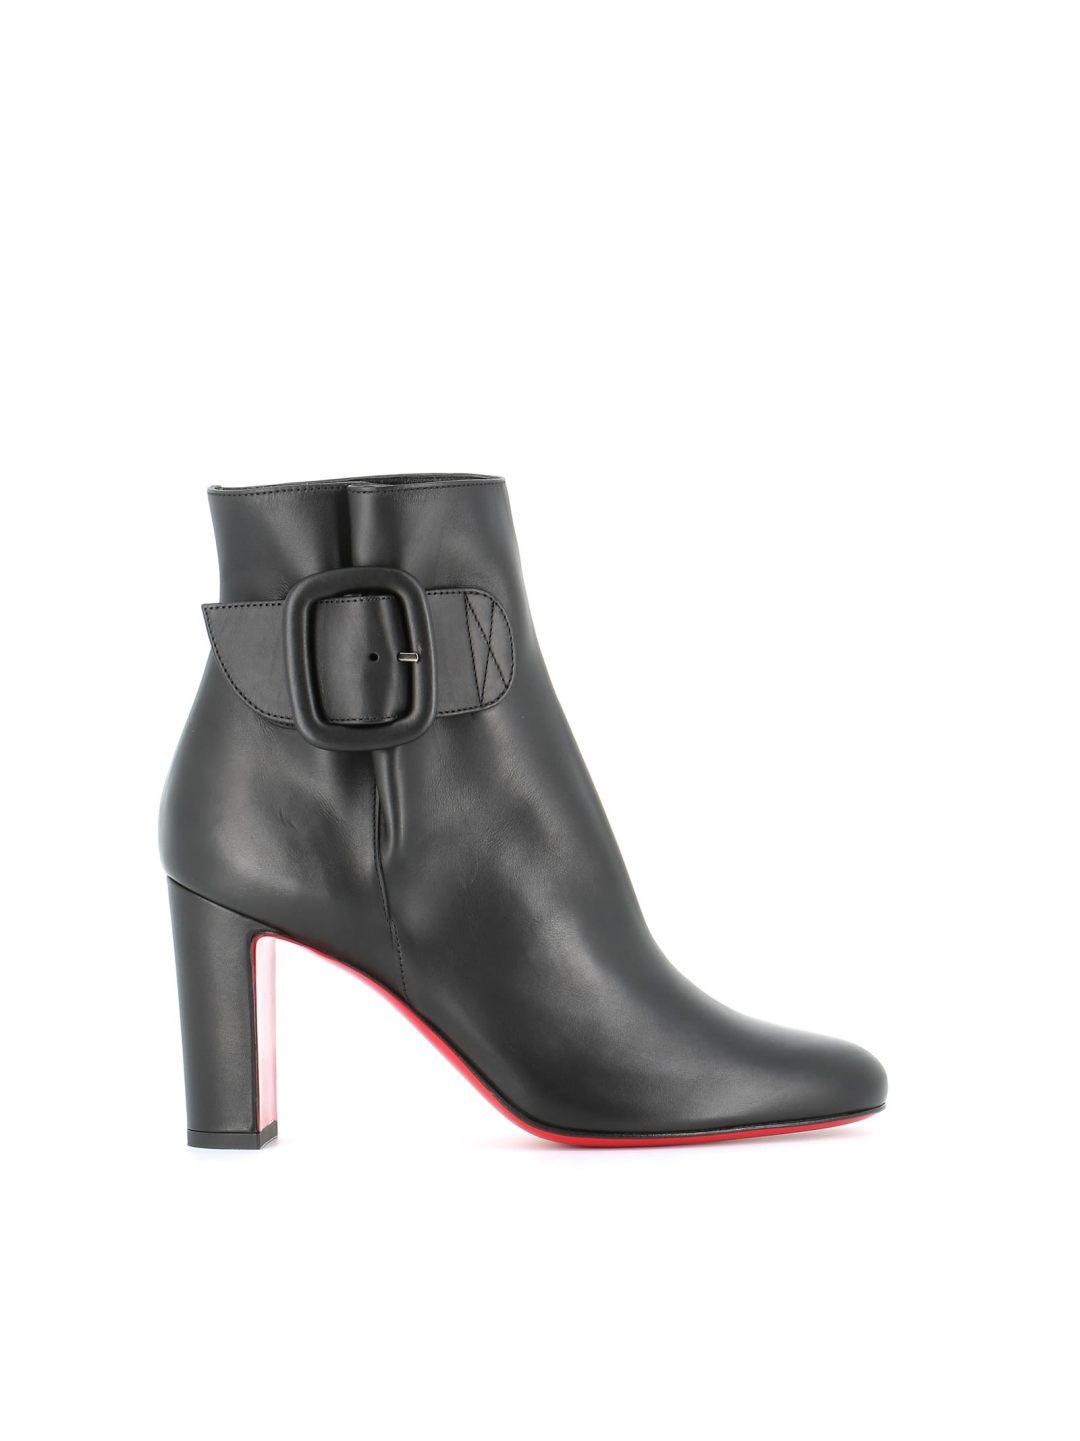 c9eddc61208eb ... $970.18 – Christian Louboutin Aurelien Calf/glitter Diams Sneakers –  Italist.com US – $911.31